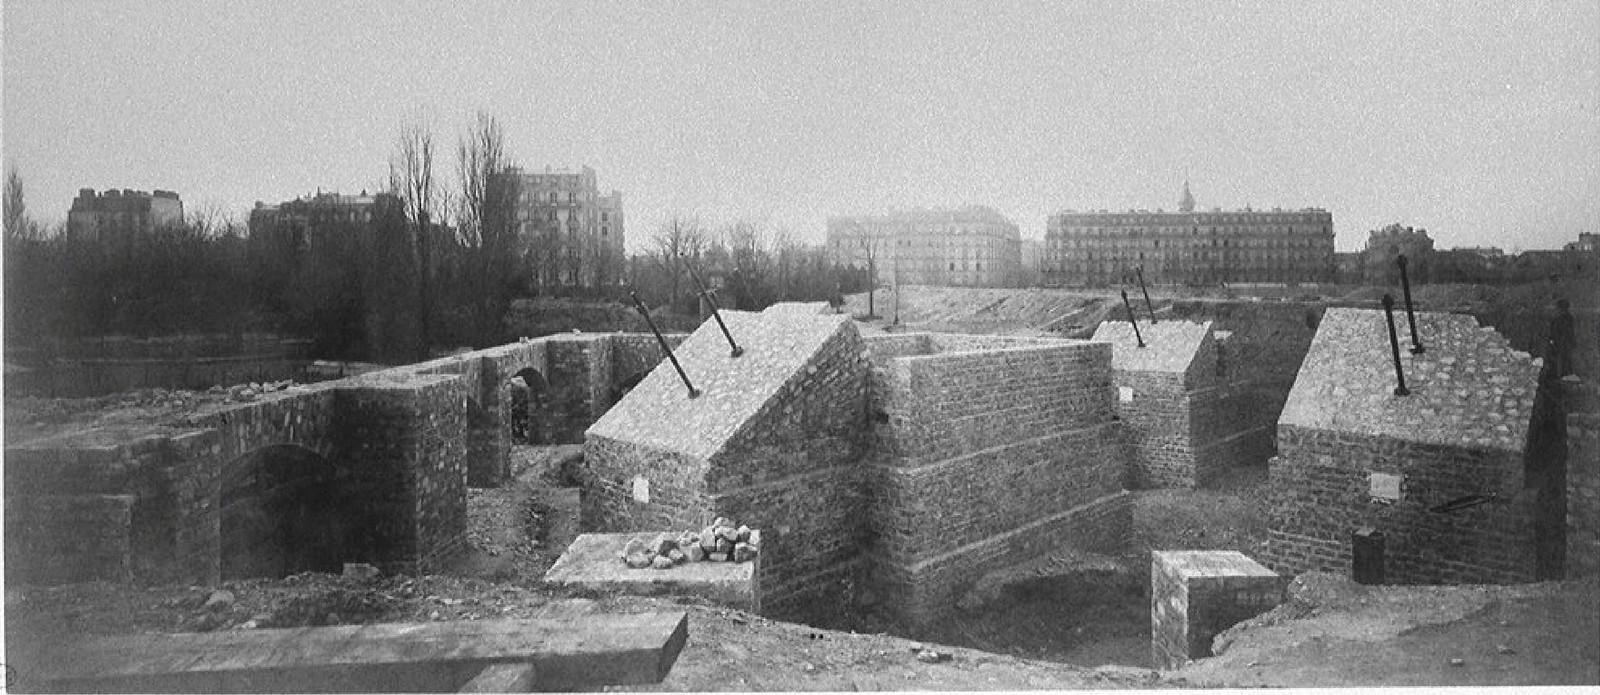 03. 1887. 17 апреля